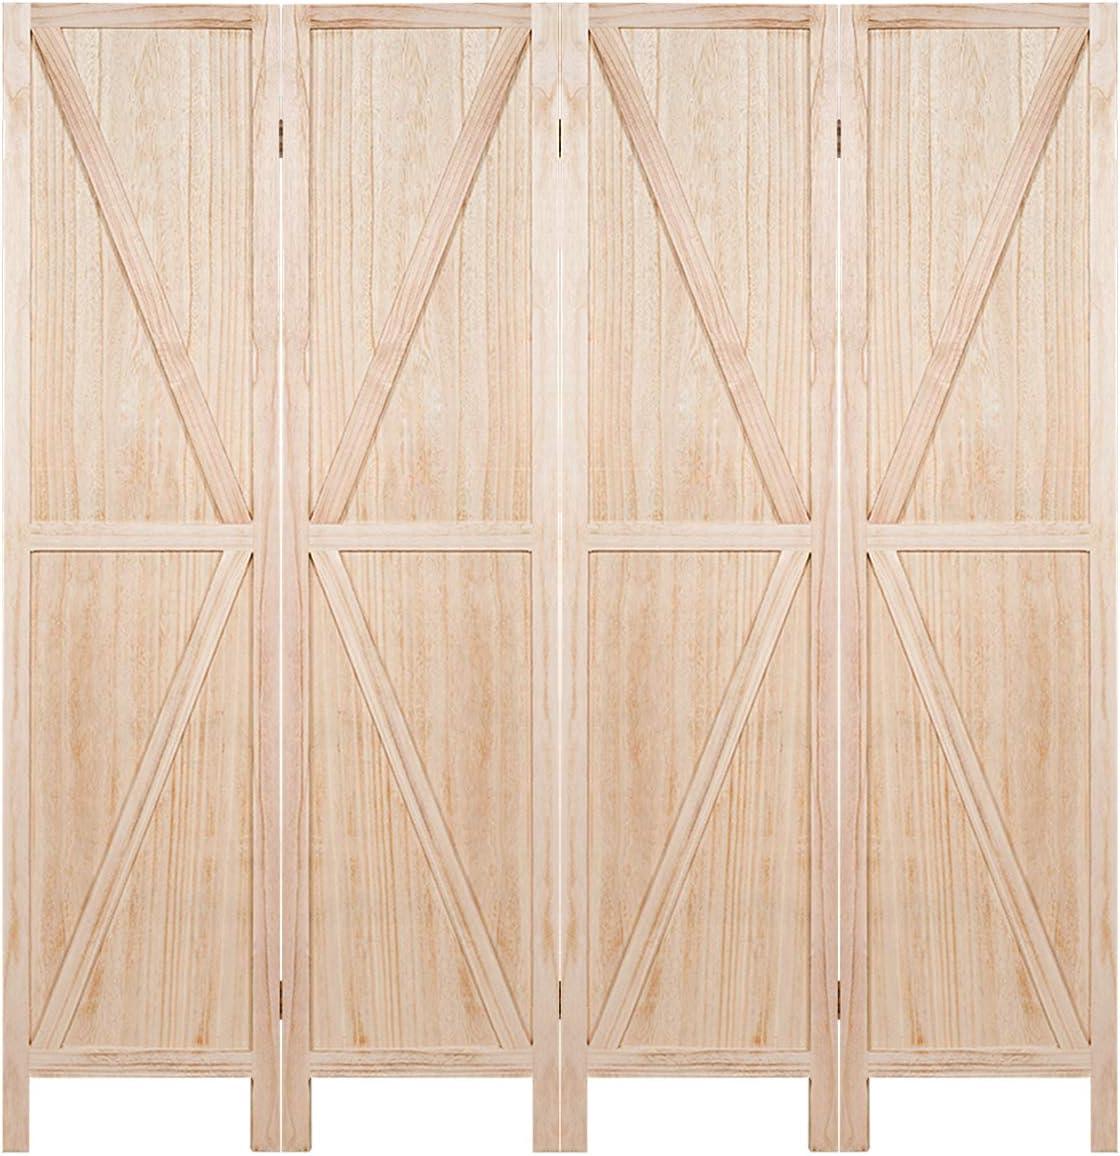 Giantex 4 Panel Folding Screen, 5.6 Ft Screen Room Divider w V-Shaped Long Edge Ornament, Wood Folding Privacy Screens Natural